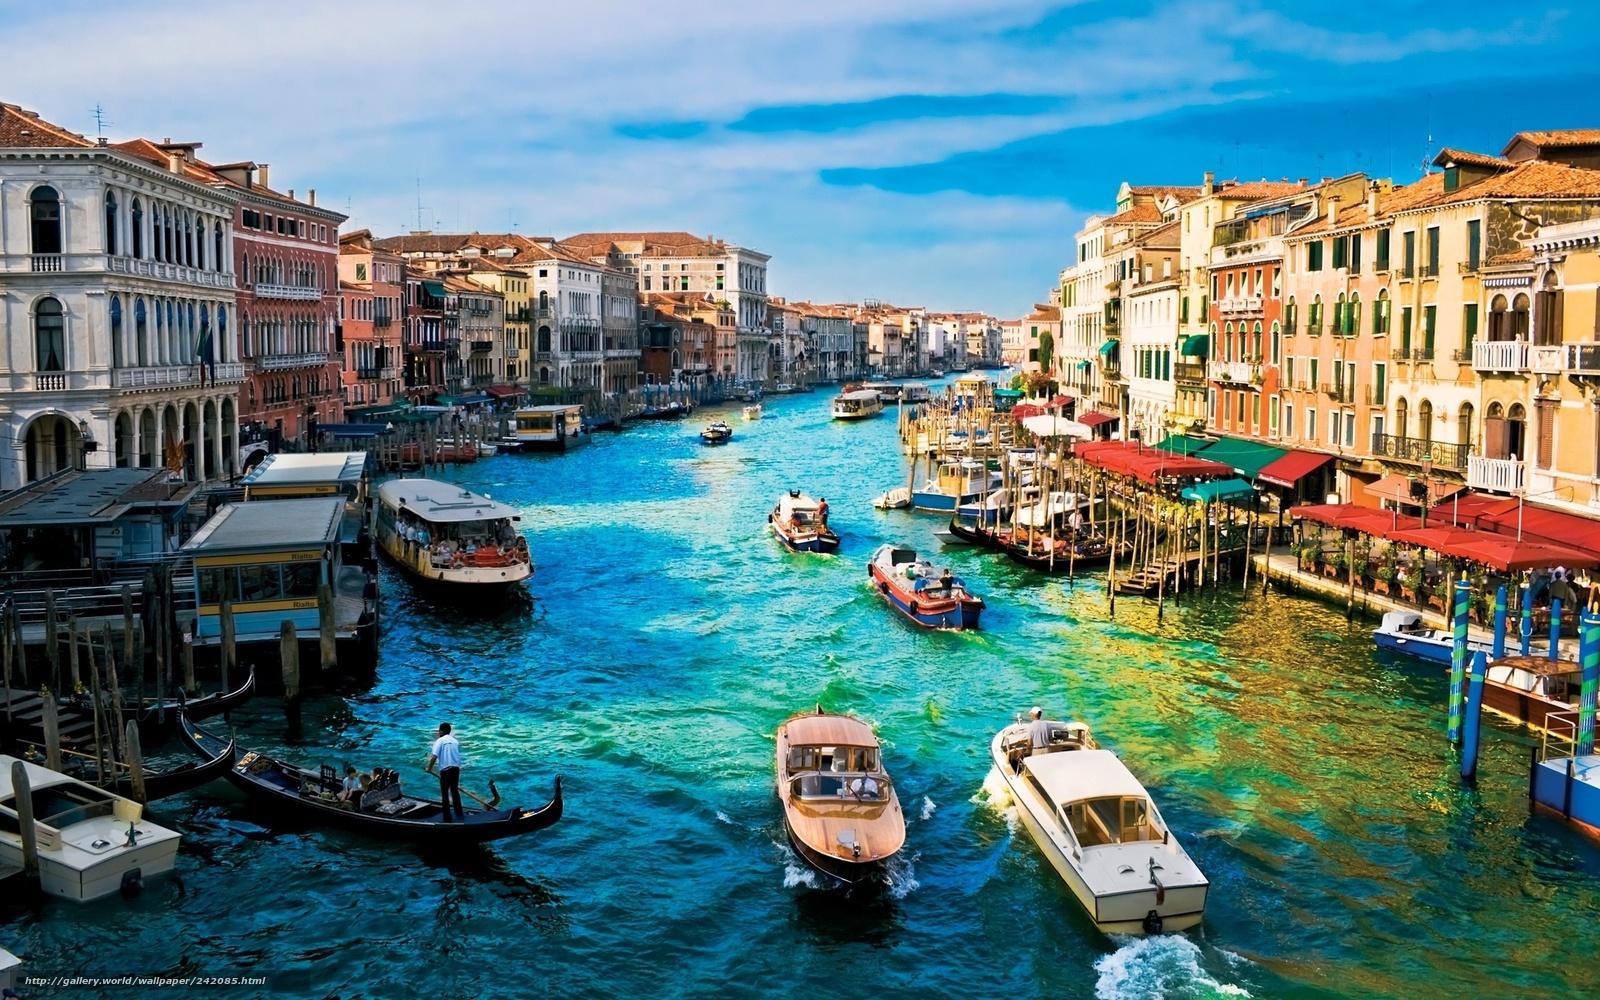 wallpaper Italy Venice channel building desktop wallpaper 1600x1000